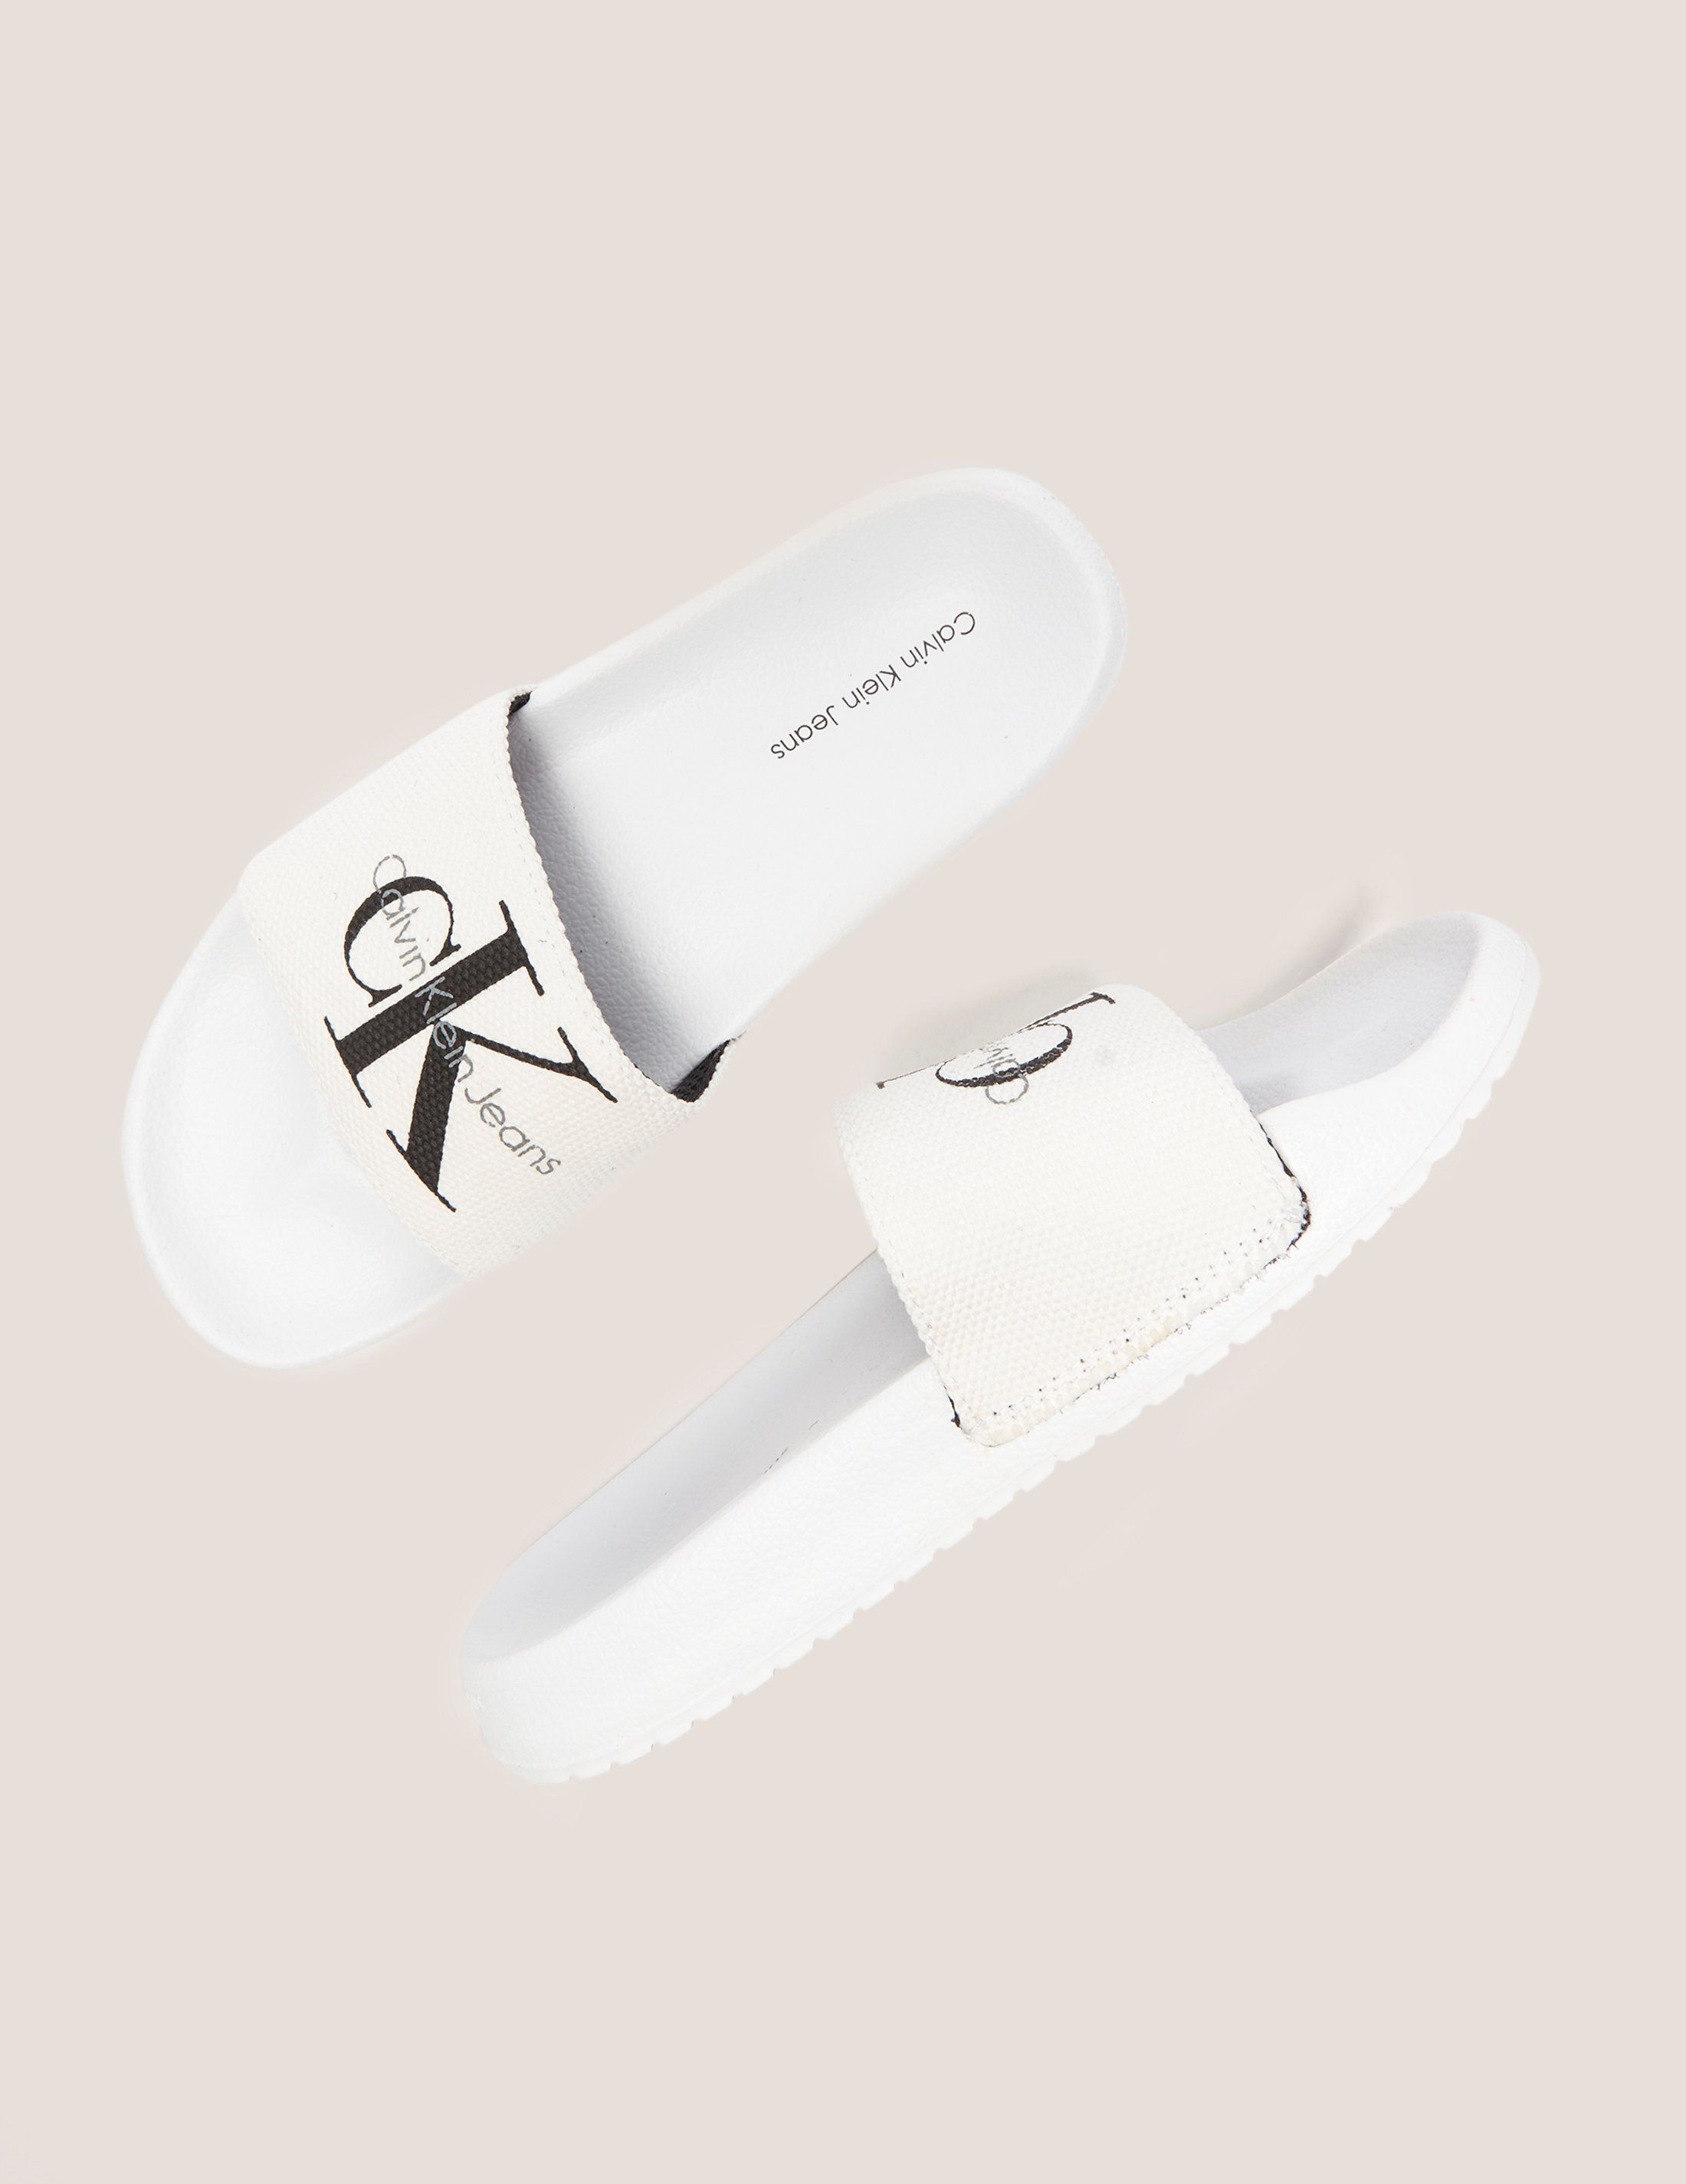 Calvin Klein Jeans Chantal Slides Women's